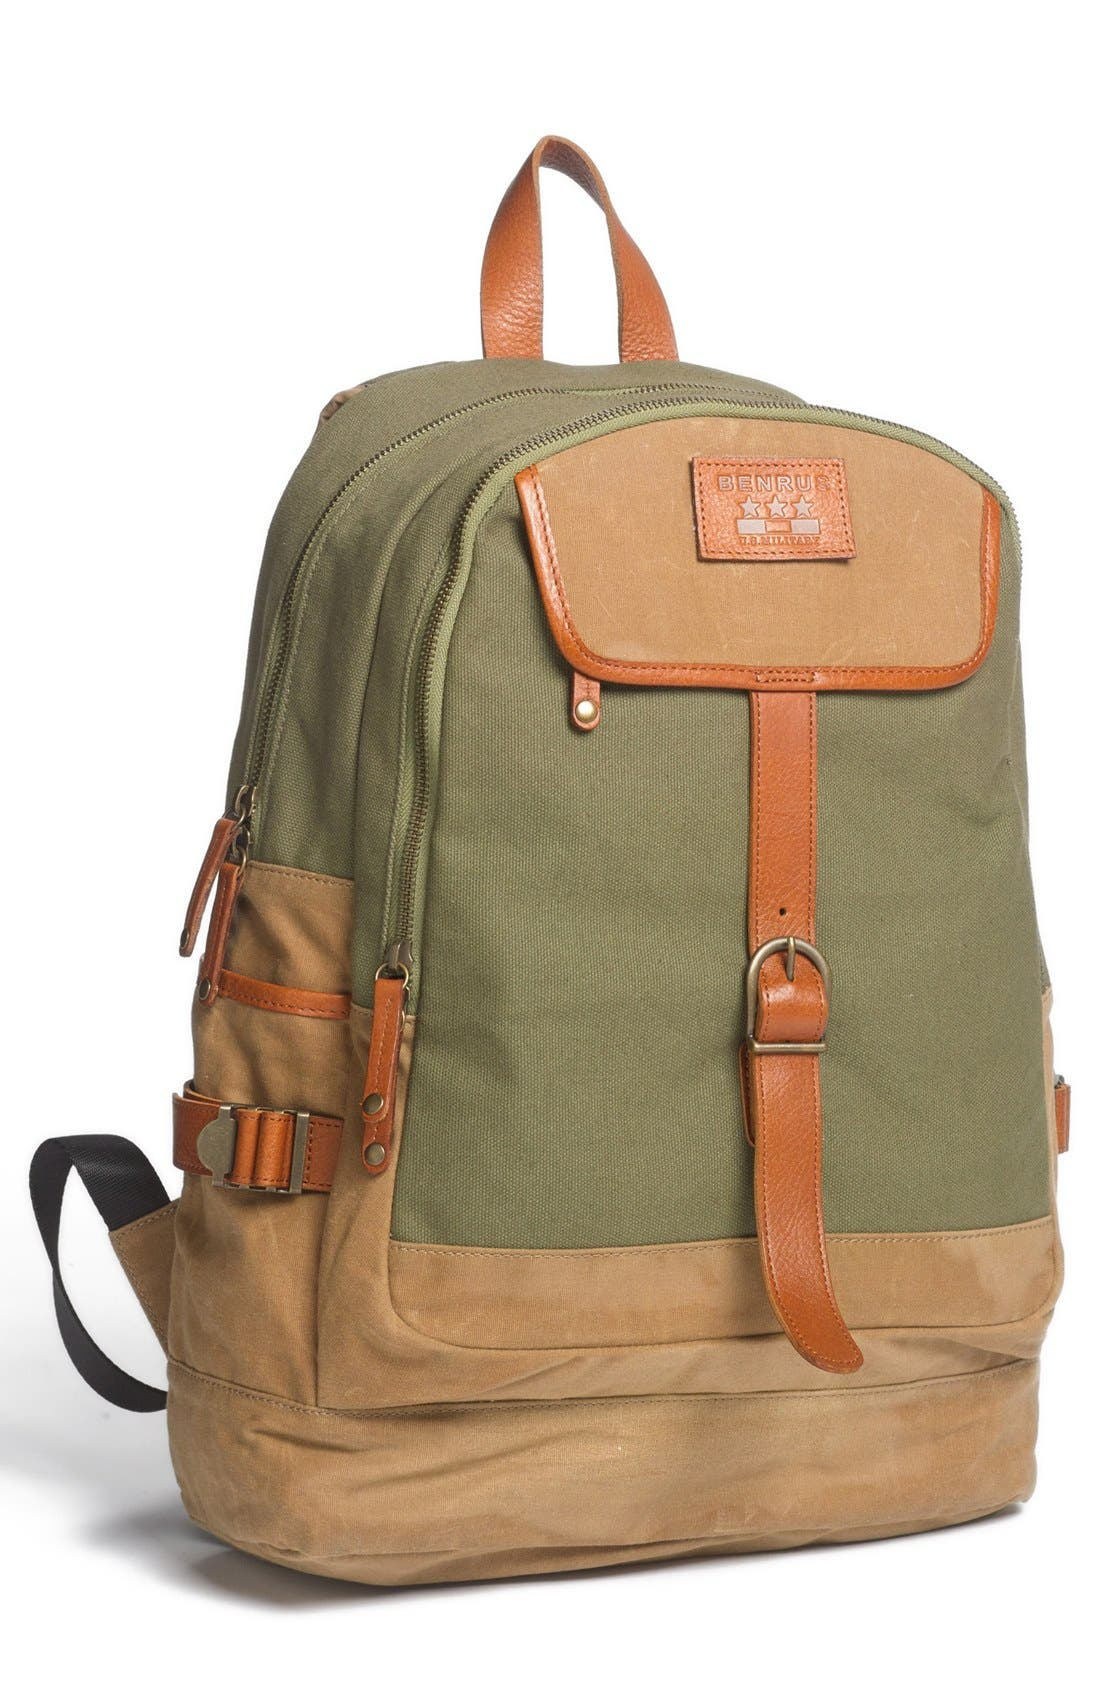 Alternate Image 1 Selected - Benrus 'Sentry' Backpack